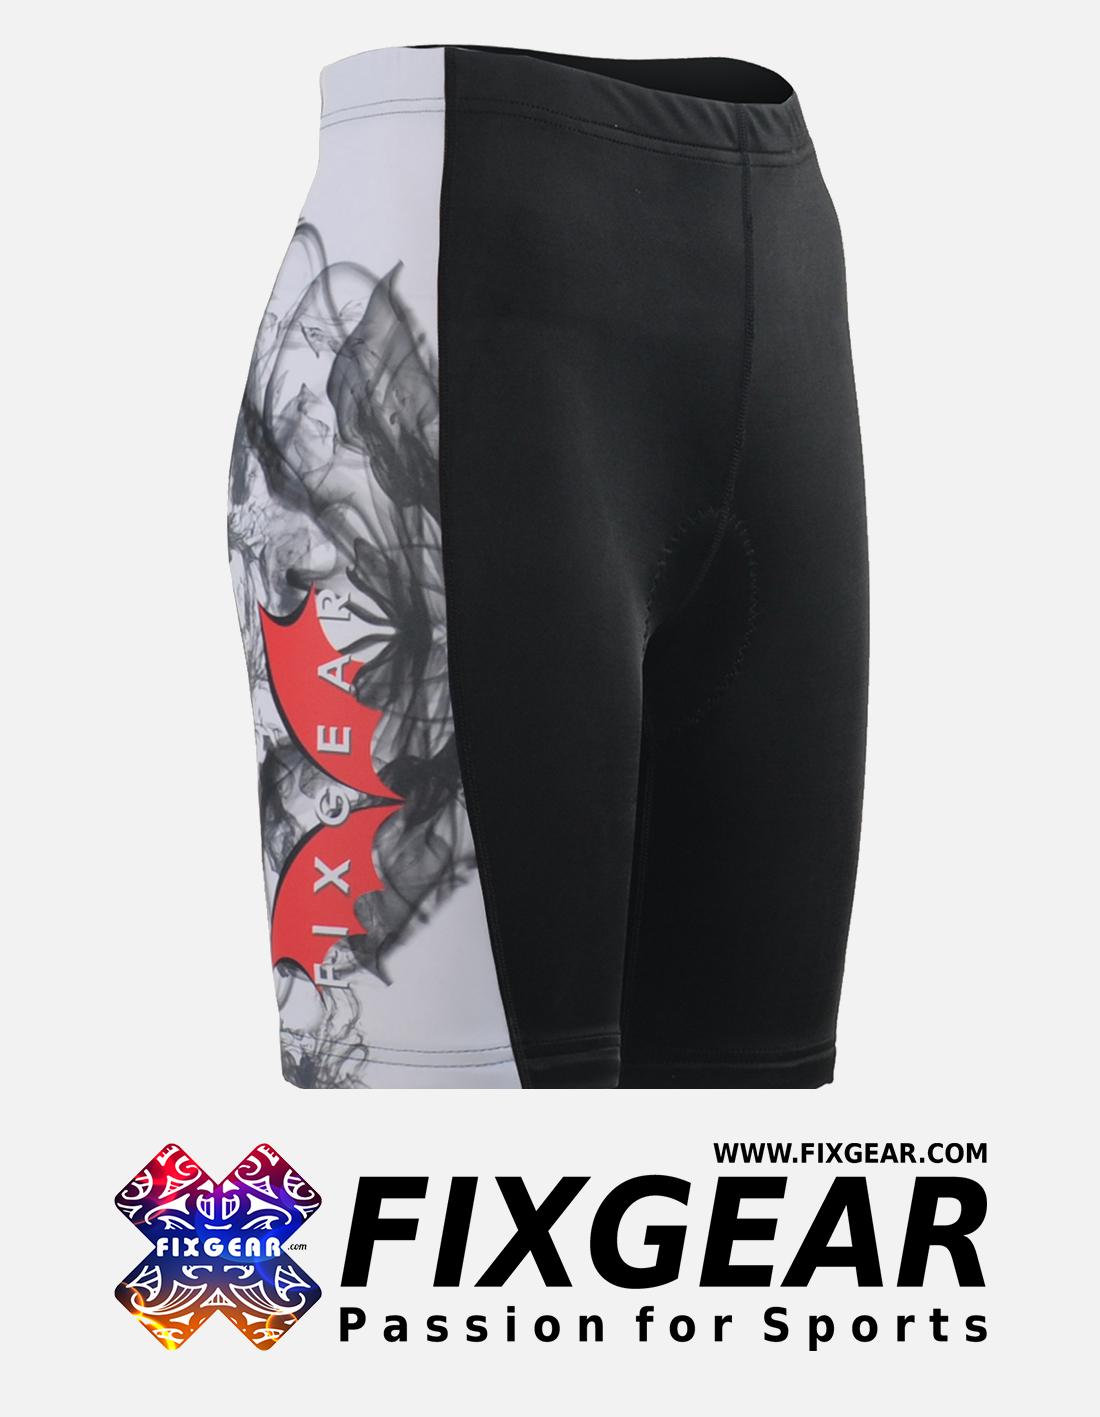 FIXGEAR ST-WJ3 Women's Cycling Padded Shorts